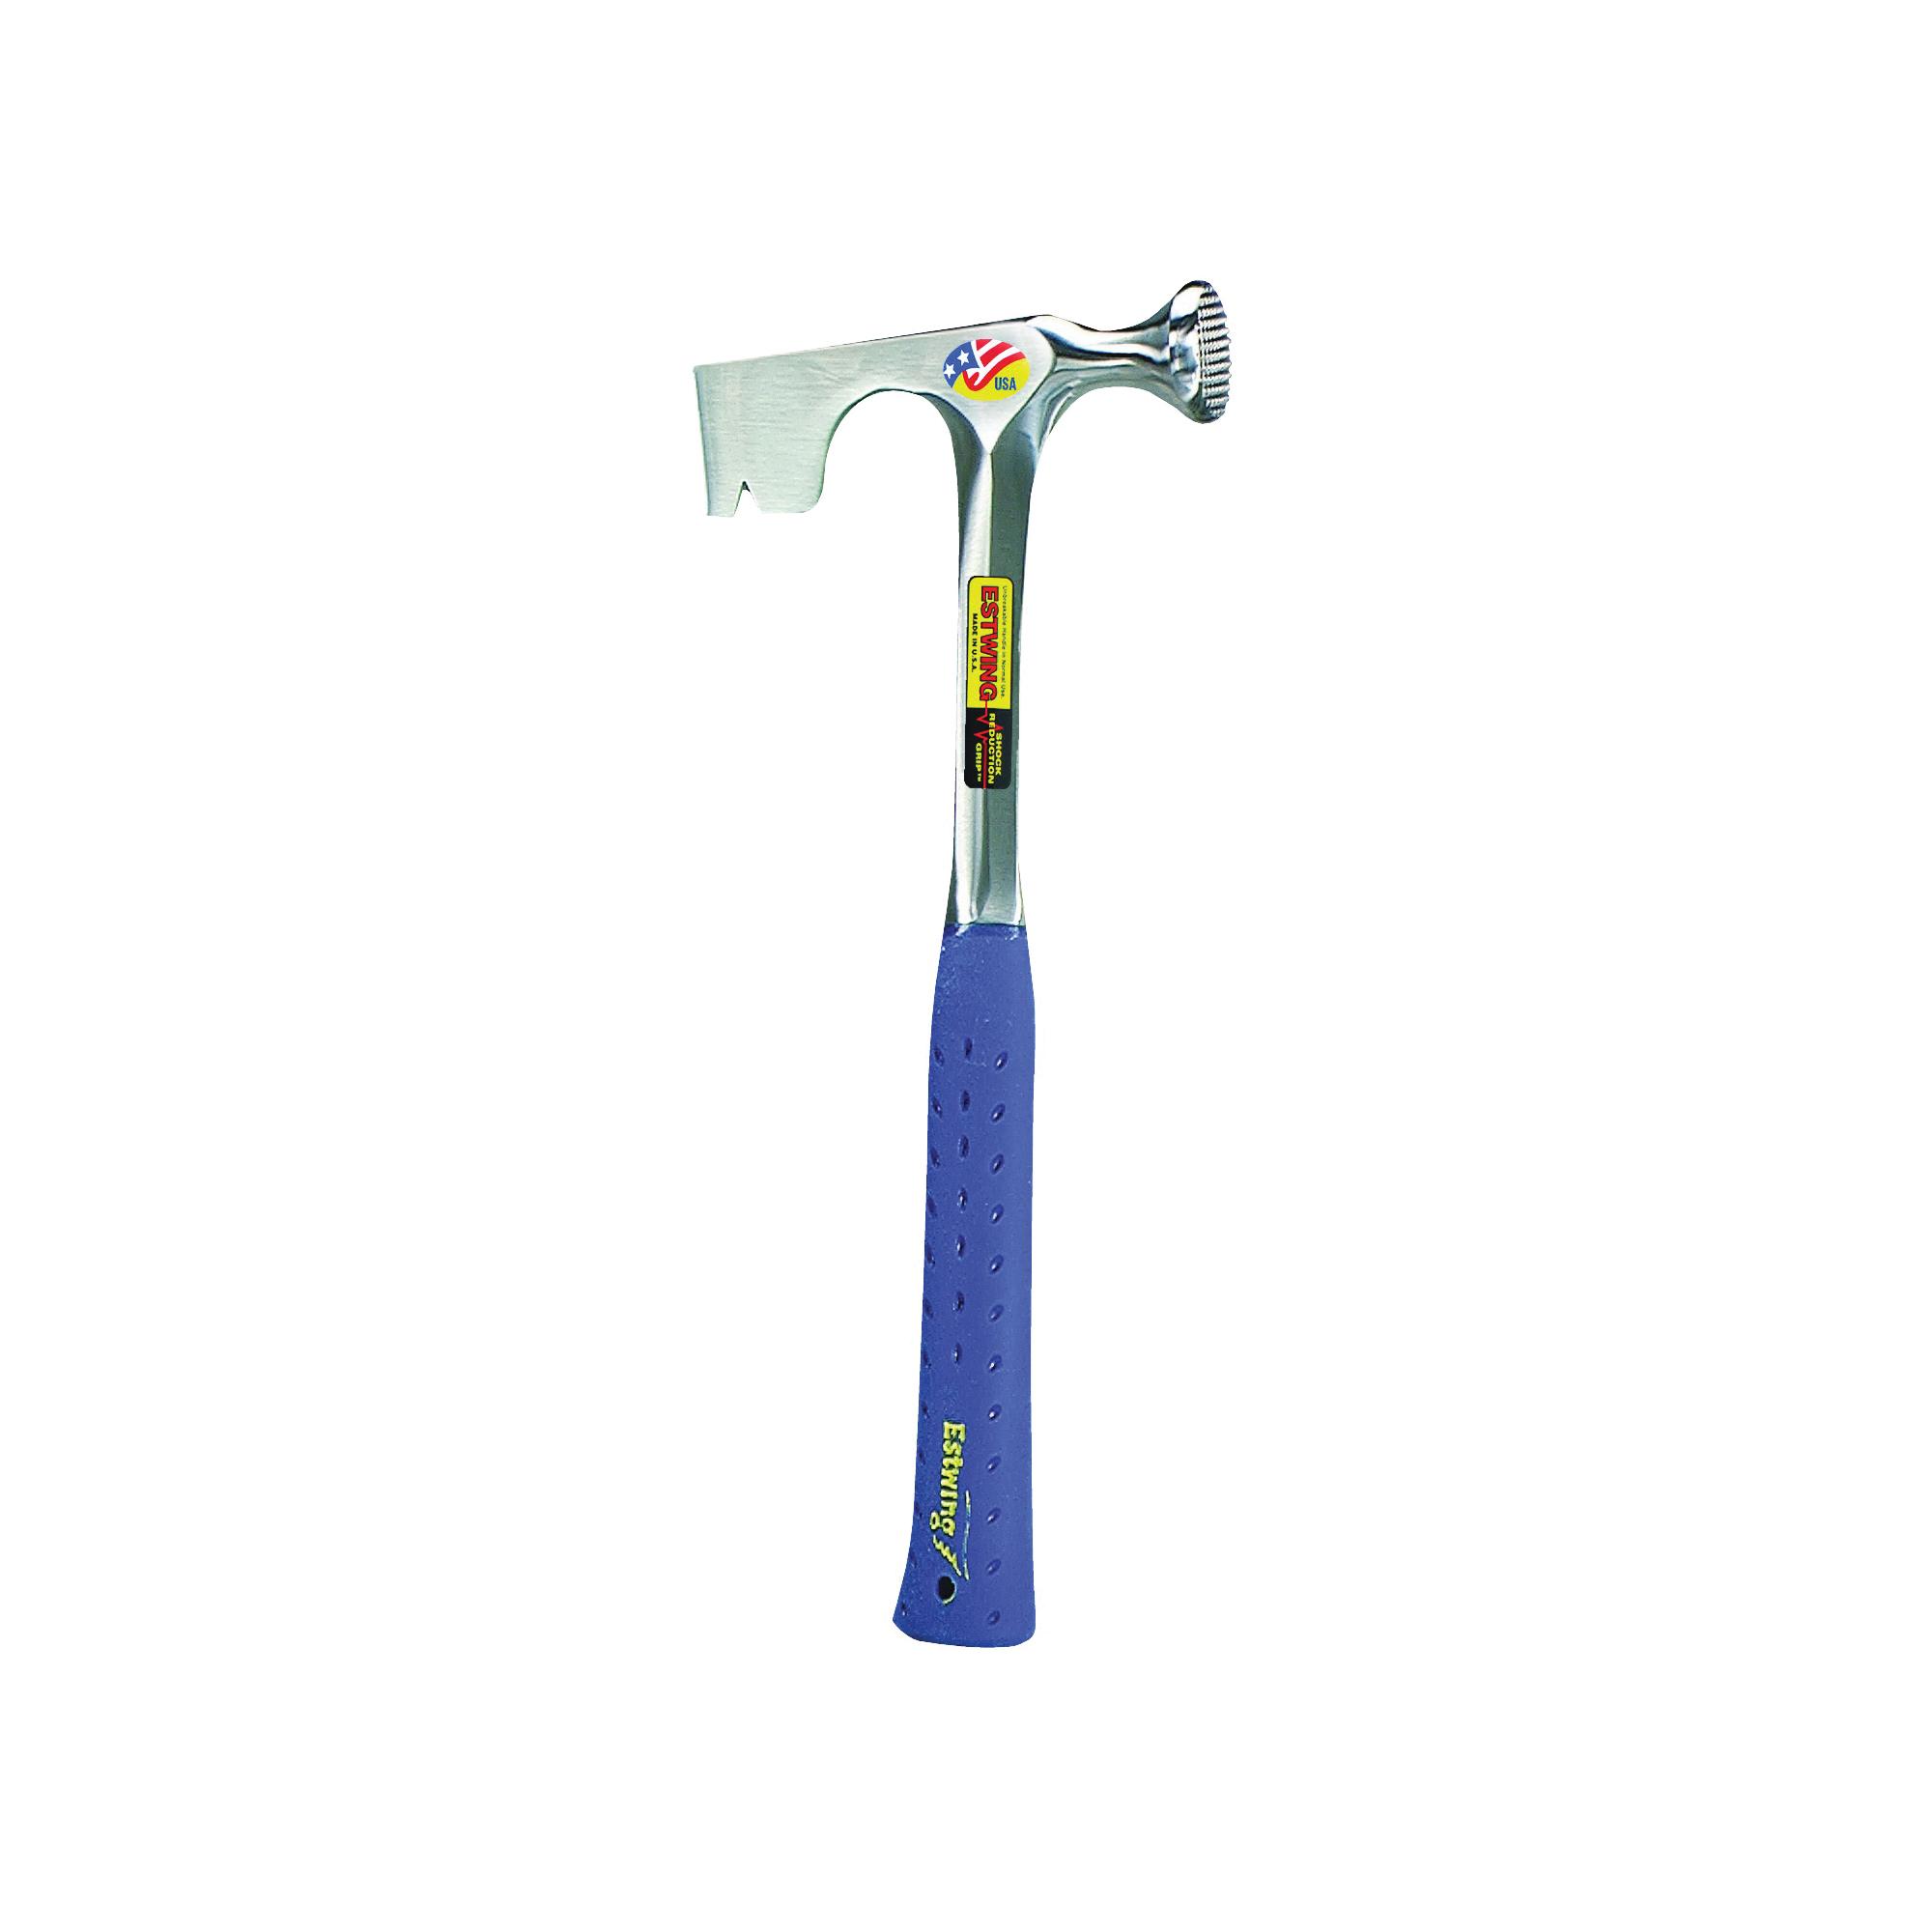 Picture of Estwing E3-11 Drywall Hammer, 11 oz Head, Milled Head, Steel Head, 14 in OAL